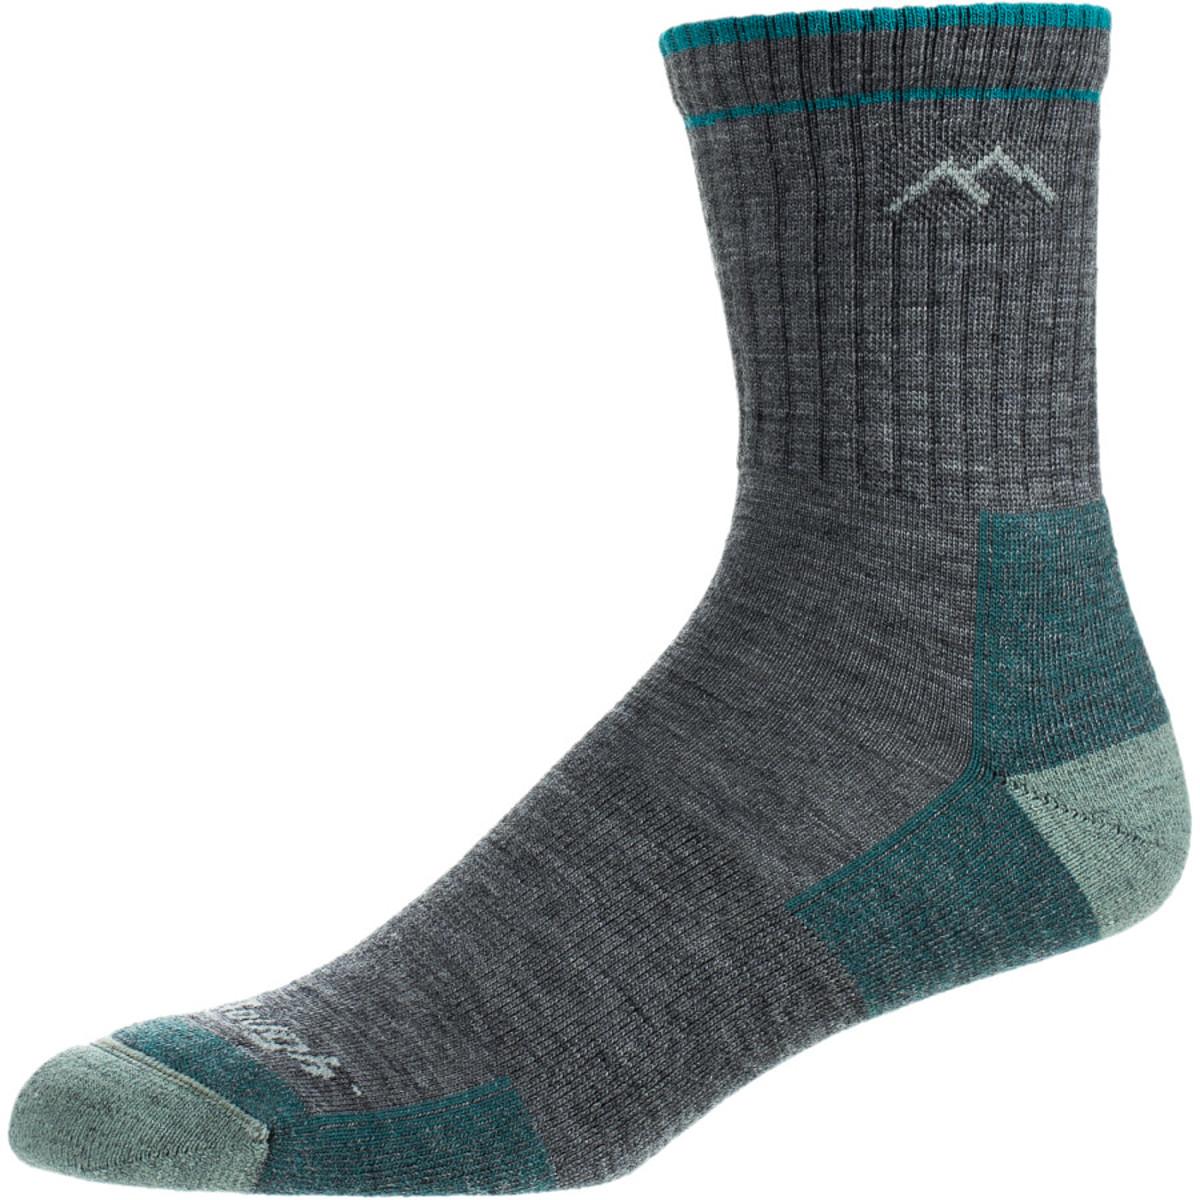 REI Merino Wool Hiking Sock Reviews